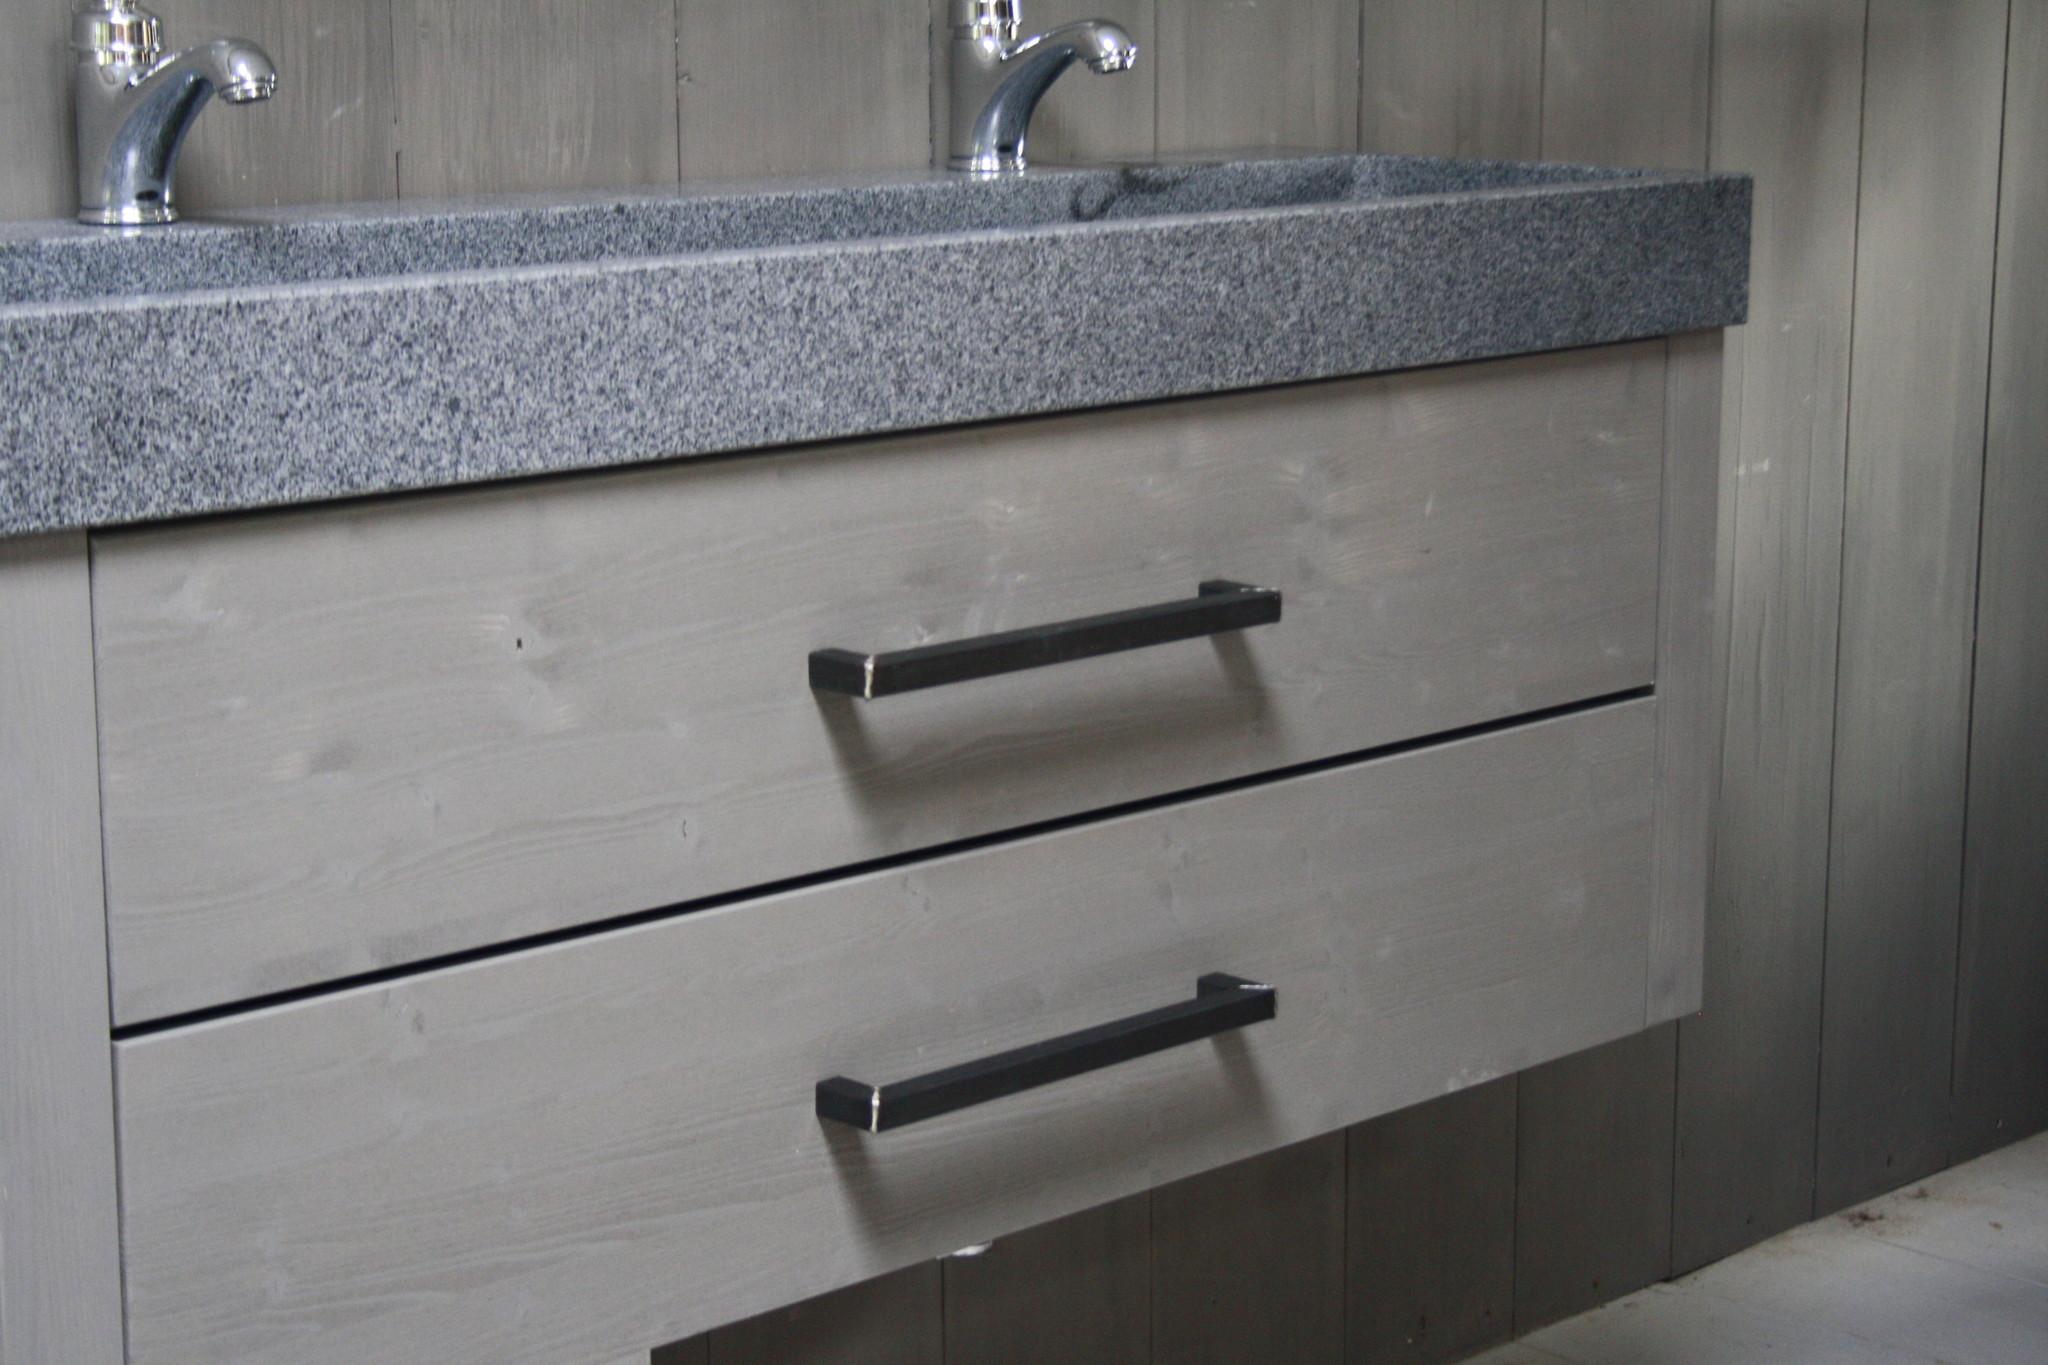 Zwevend badmeubel 140 cm dubbele spoelbak 2 lades grijs-2